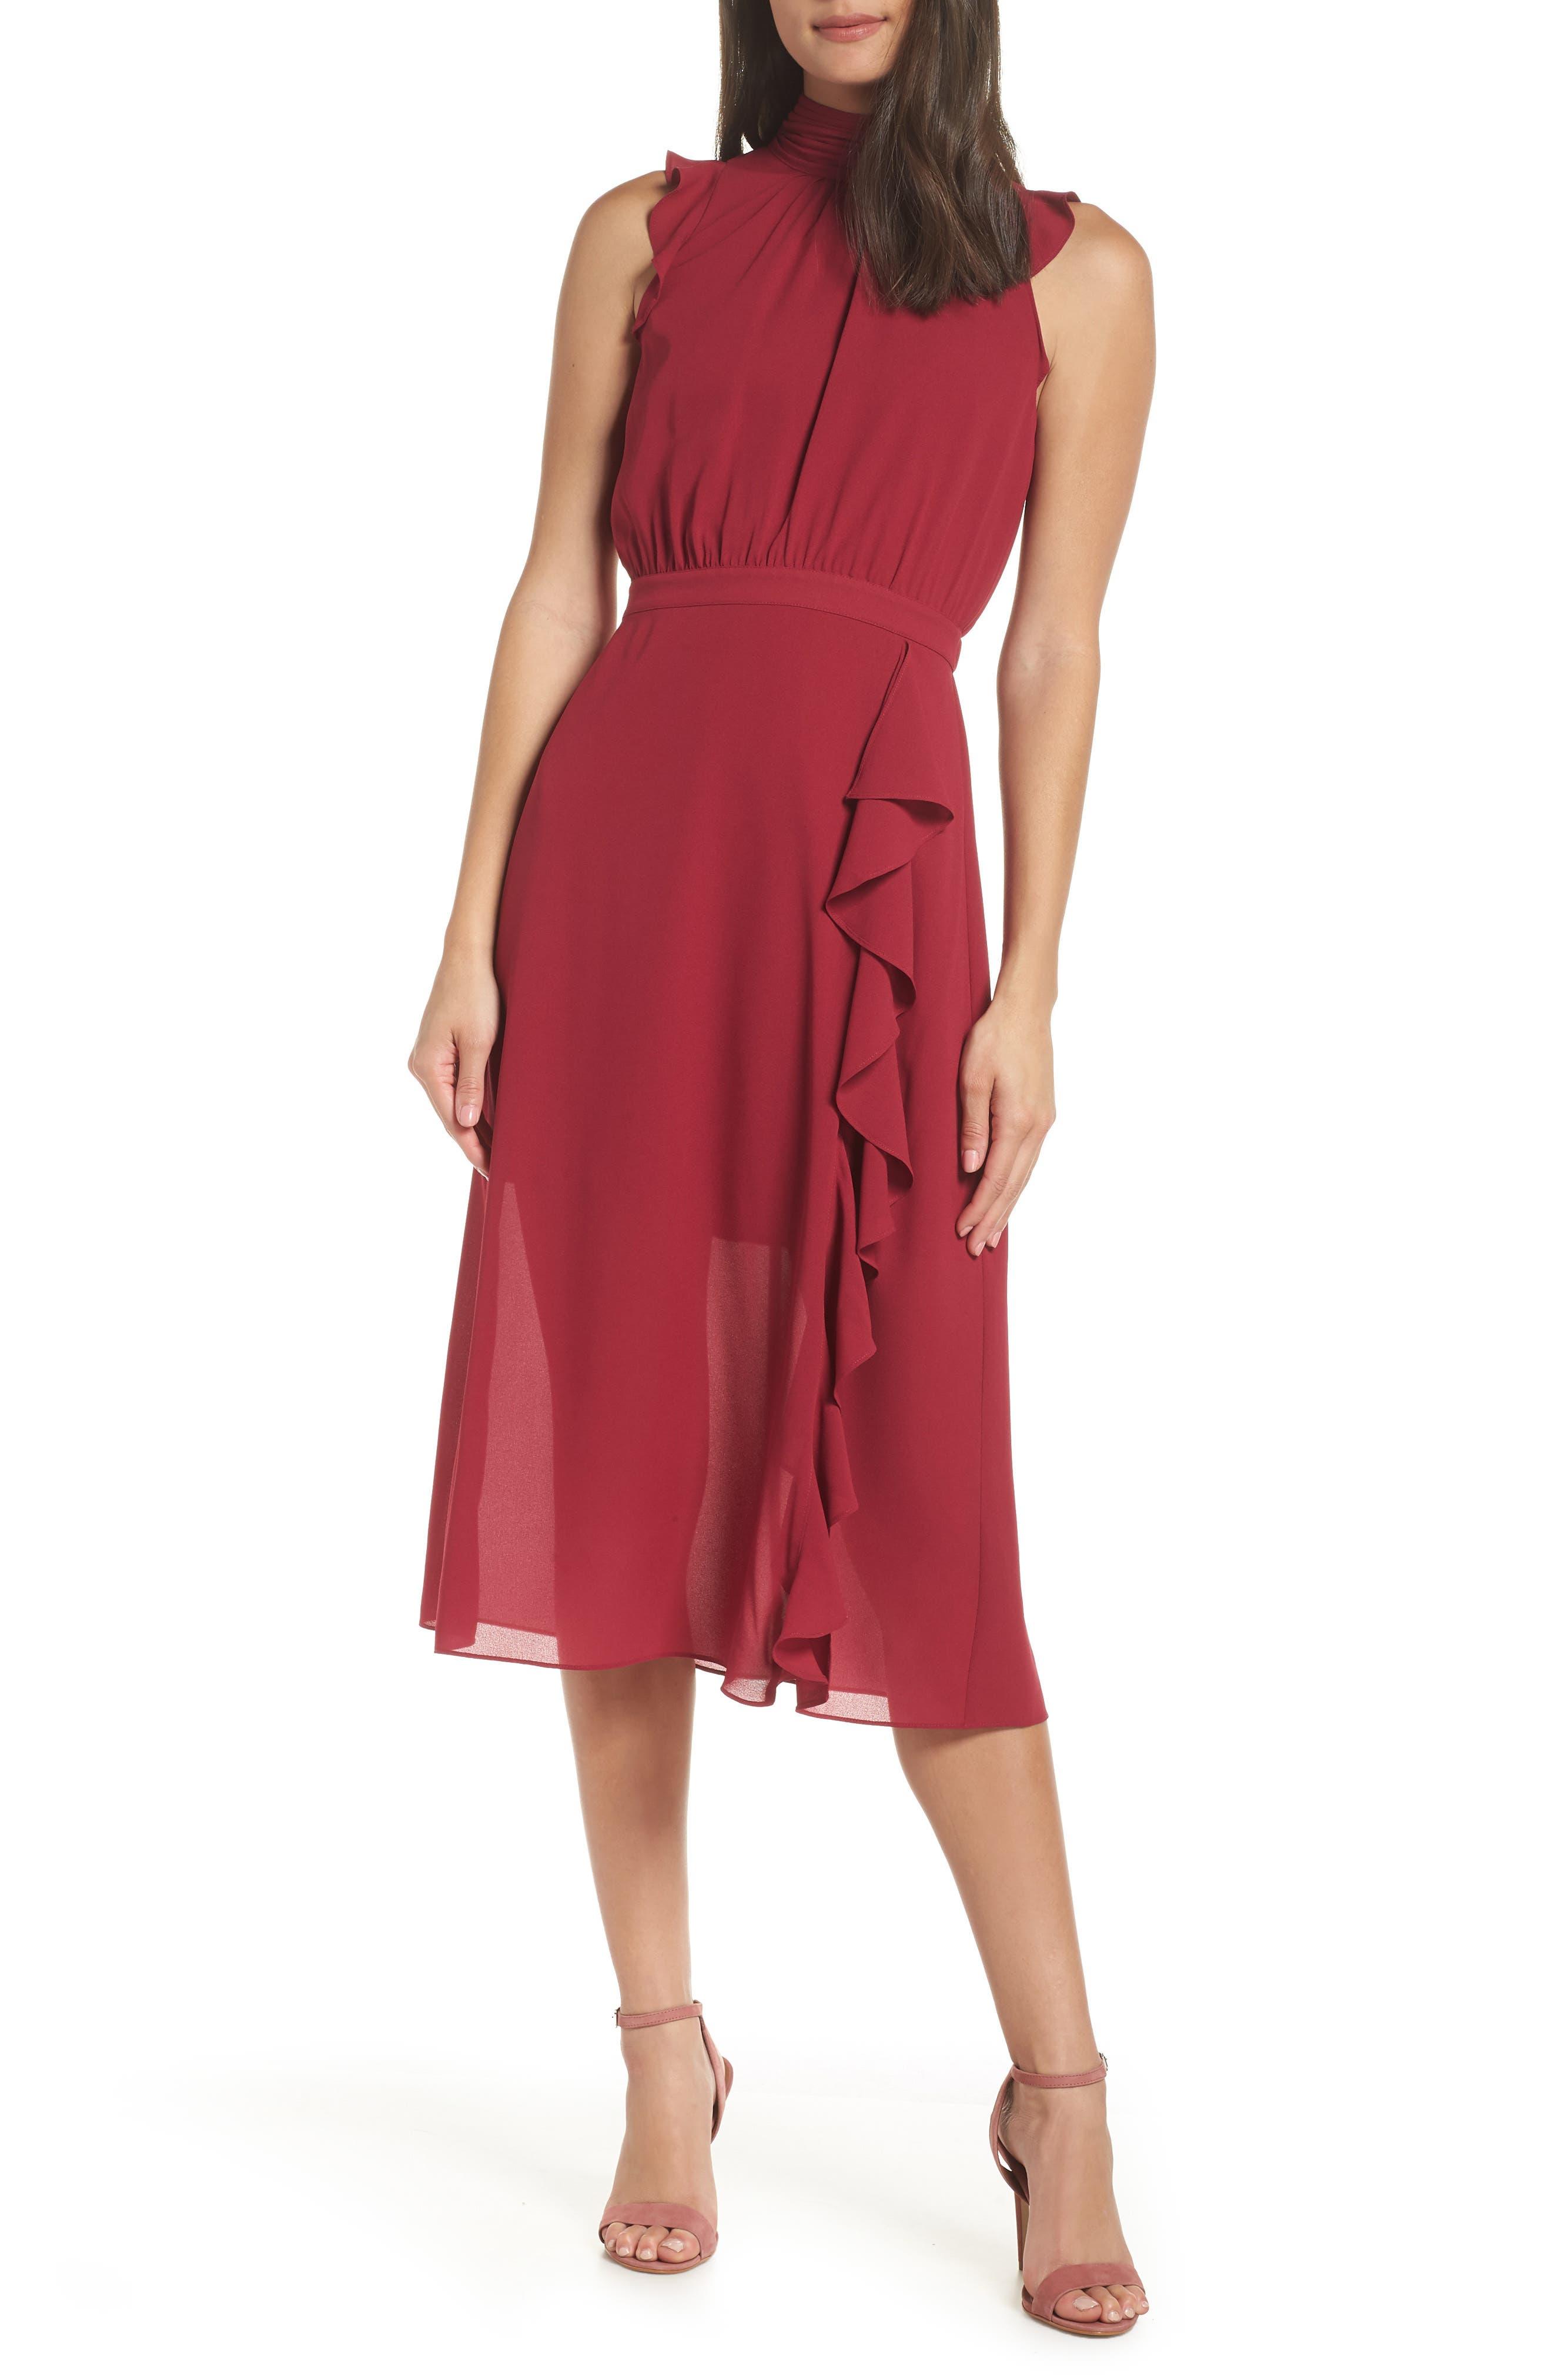 Ali & Jay Love Hangover Midi Dress, Burgundy